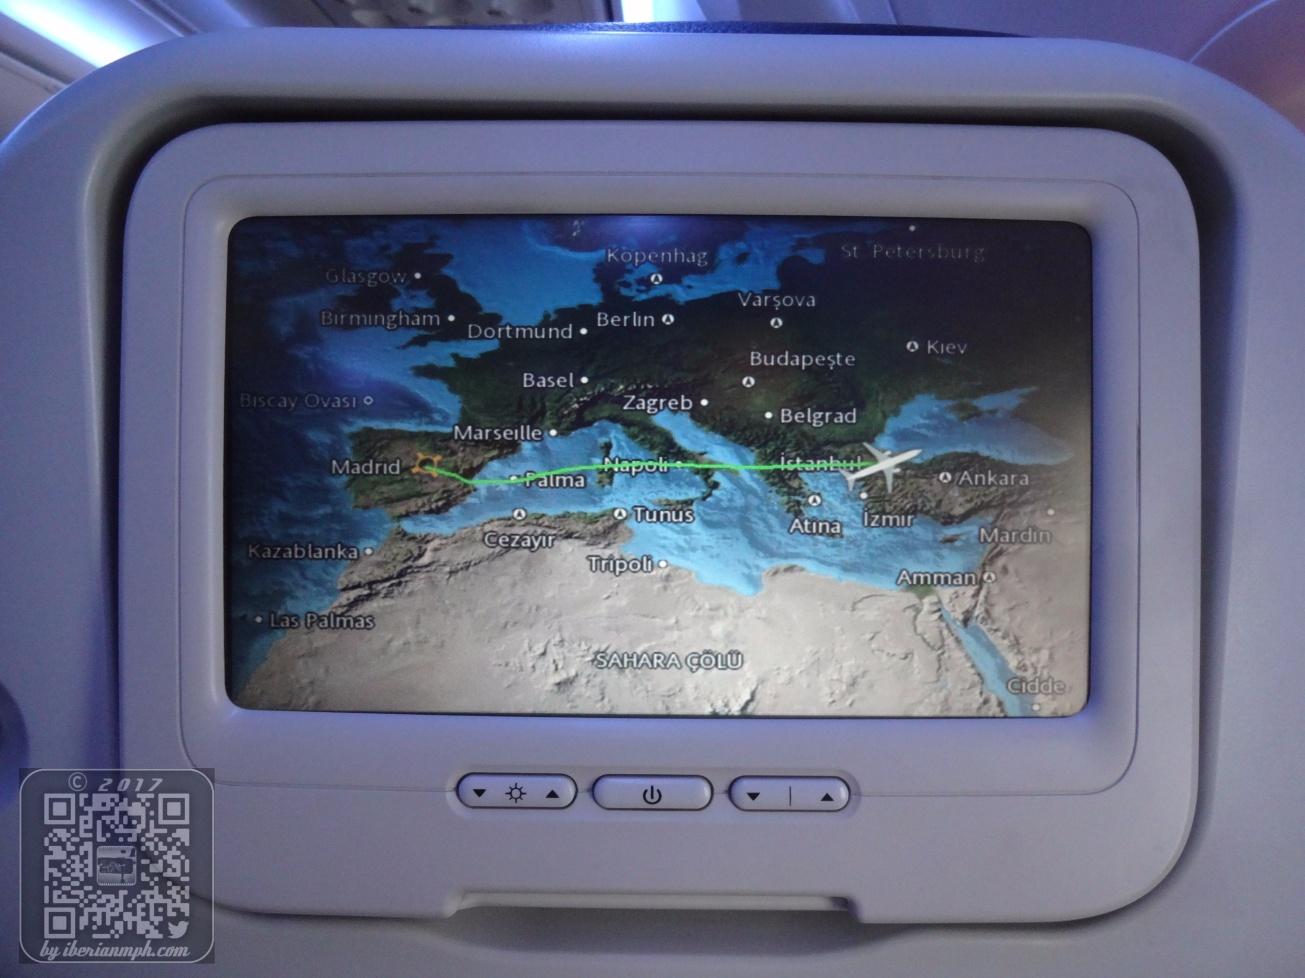 Between Sahara and Baku the choice is easy!